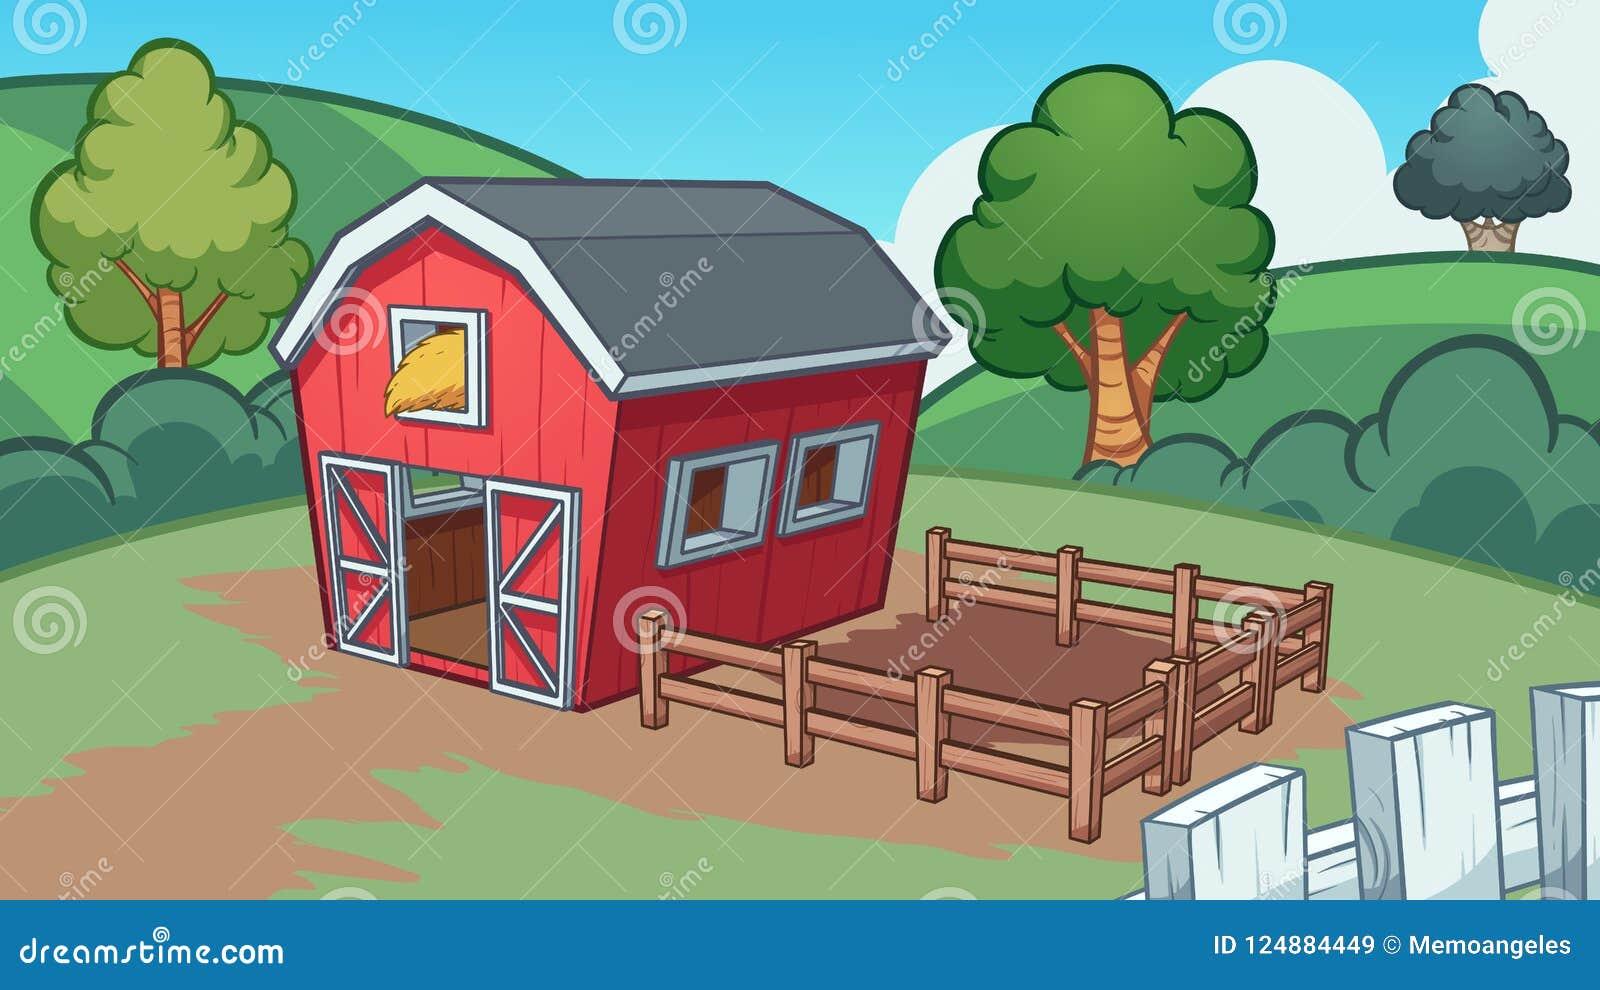 cartoon farm with red barn stock vector illustration of farm